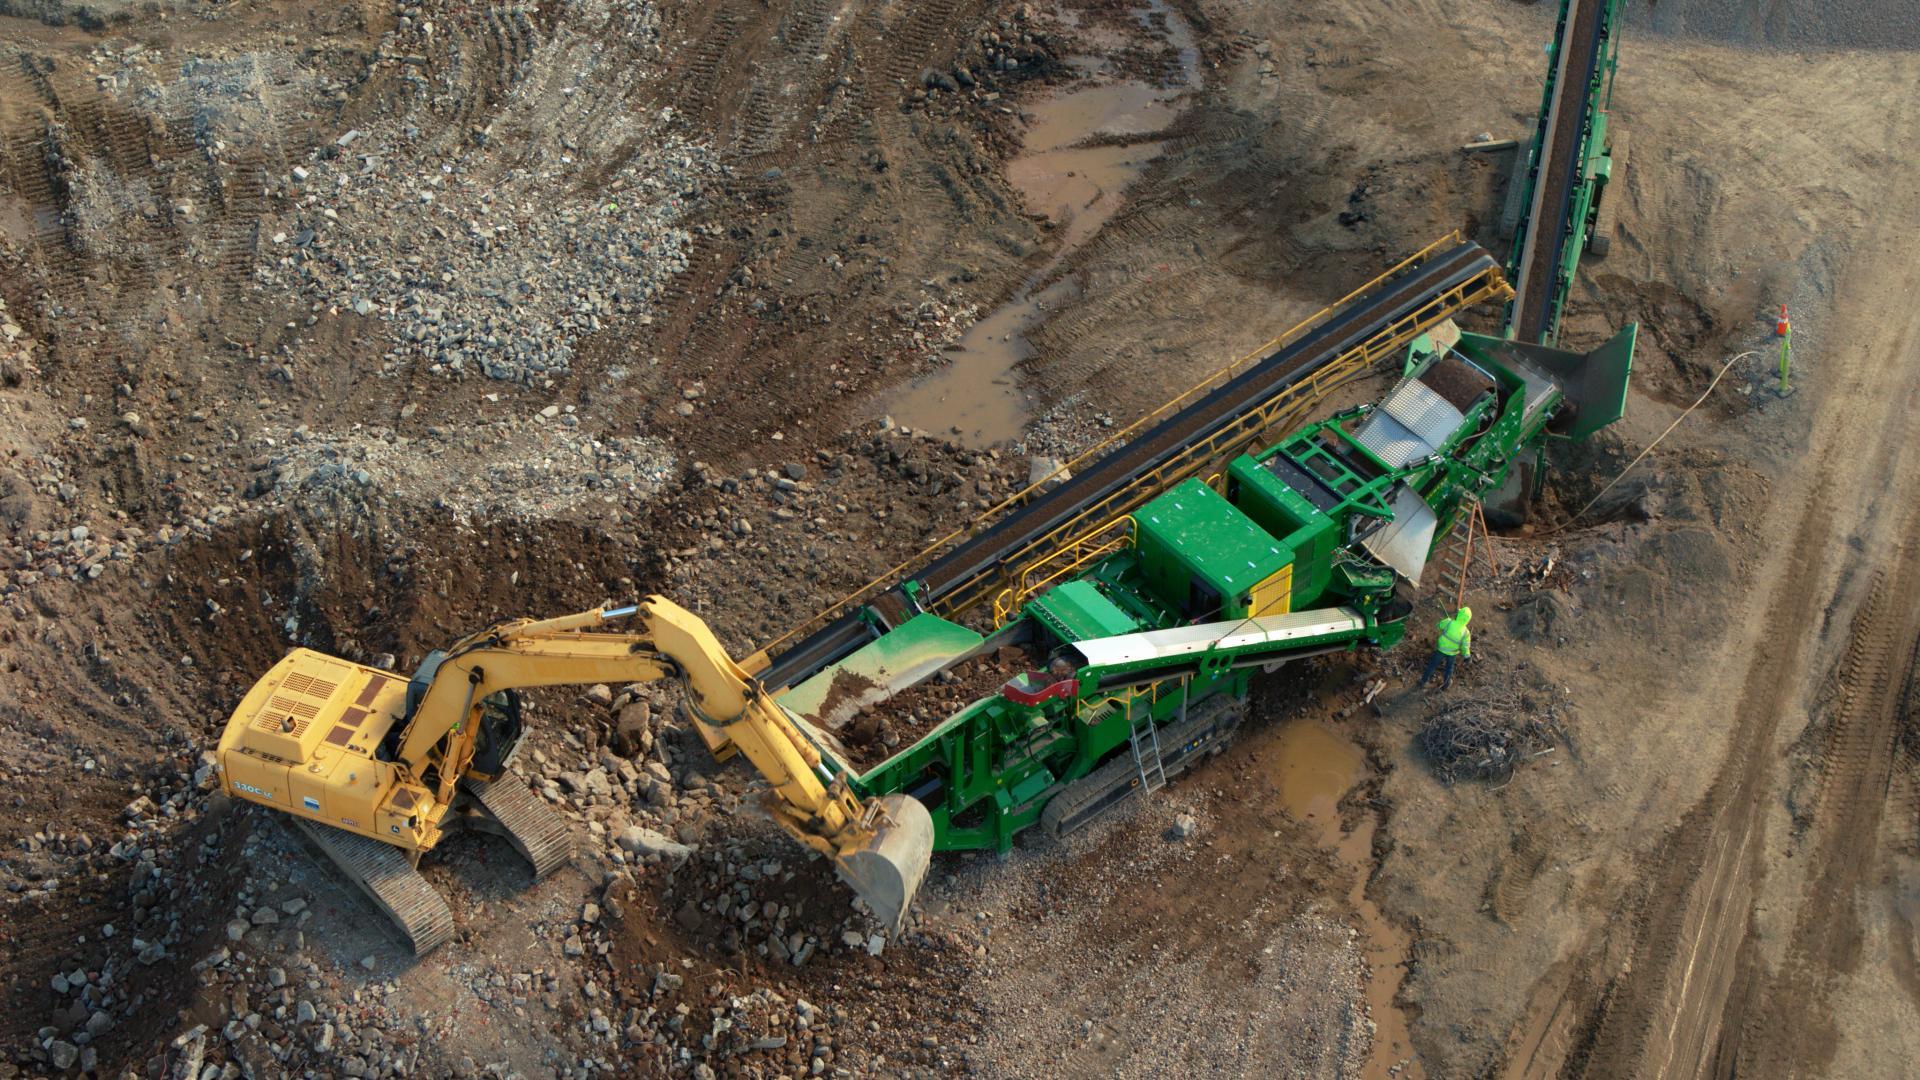 DaveSoiland-NorCalCrushers-Sonoma-County-overhead-excavator-McCloskey-crusher-conveyor